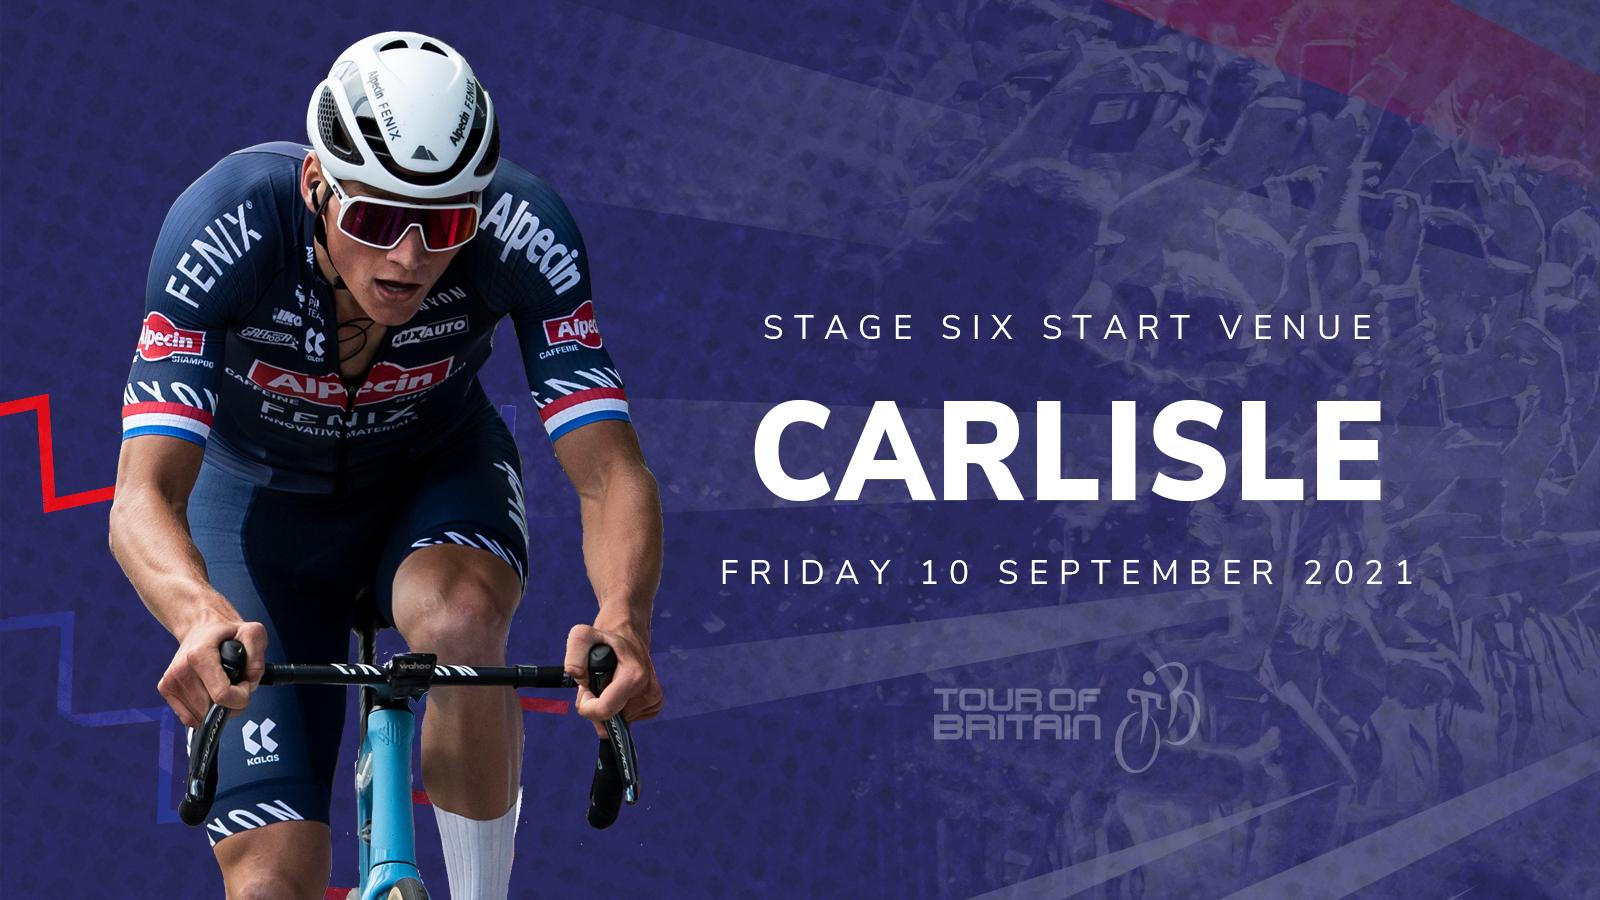 Tour of Britain Carlisle 2021